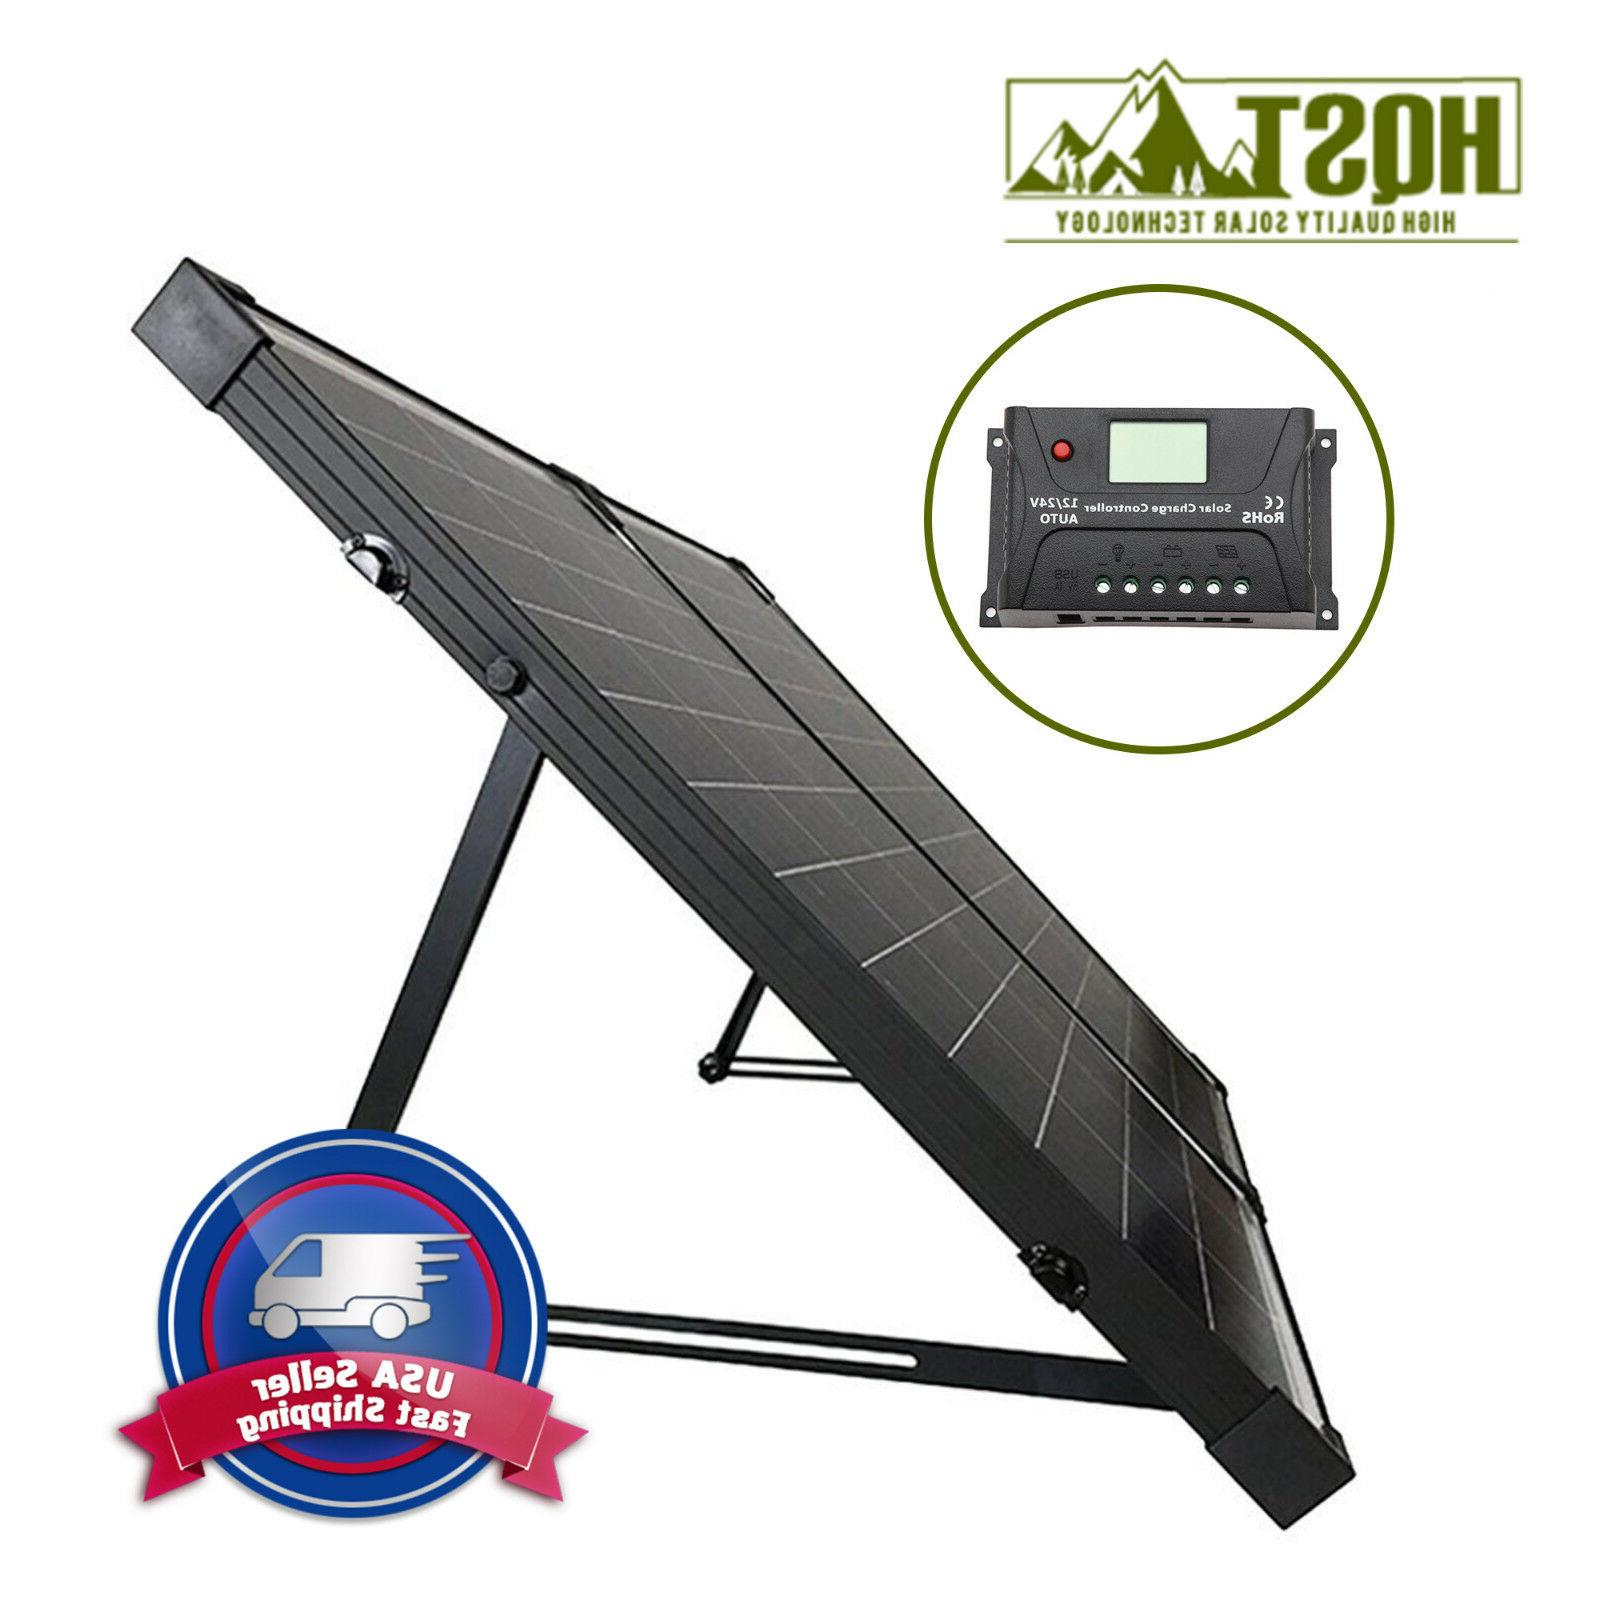 polycrystalline foldable solar suitcase